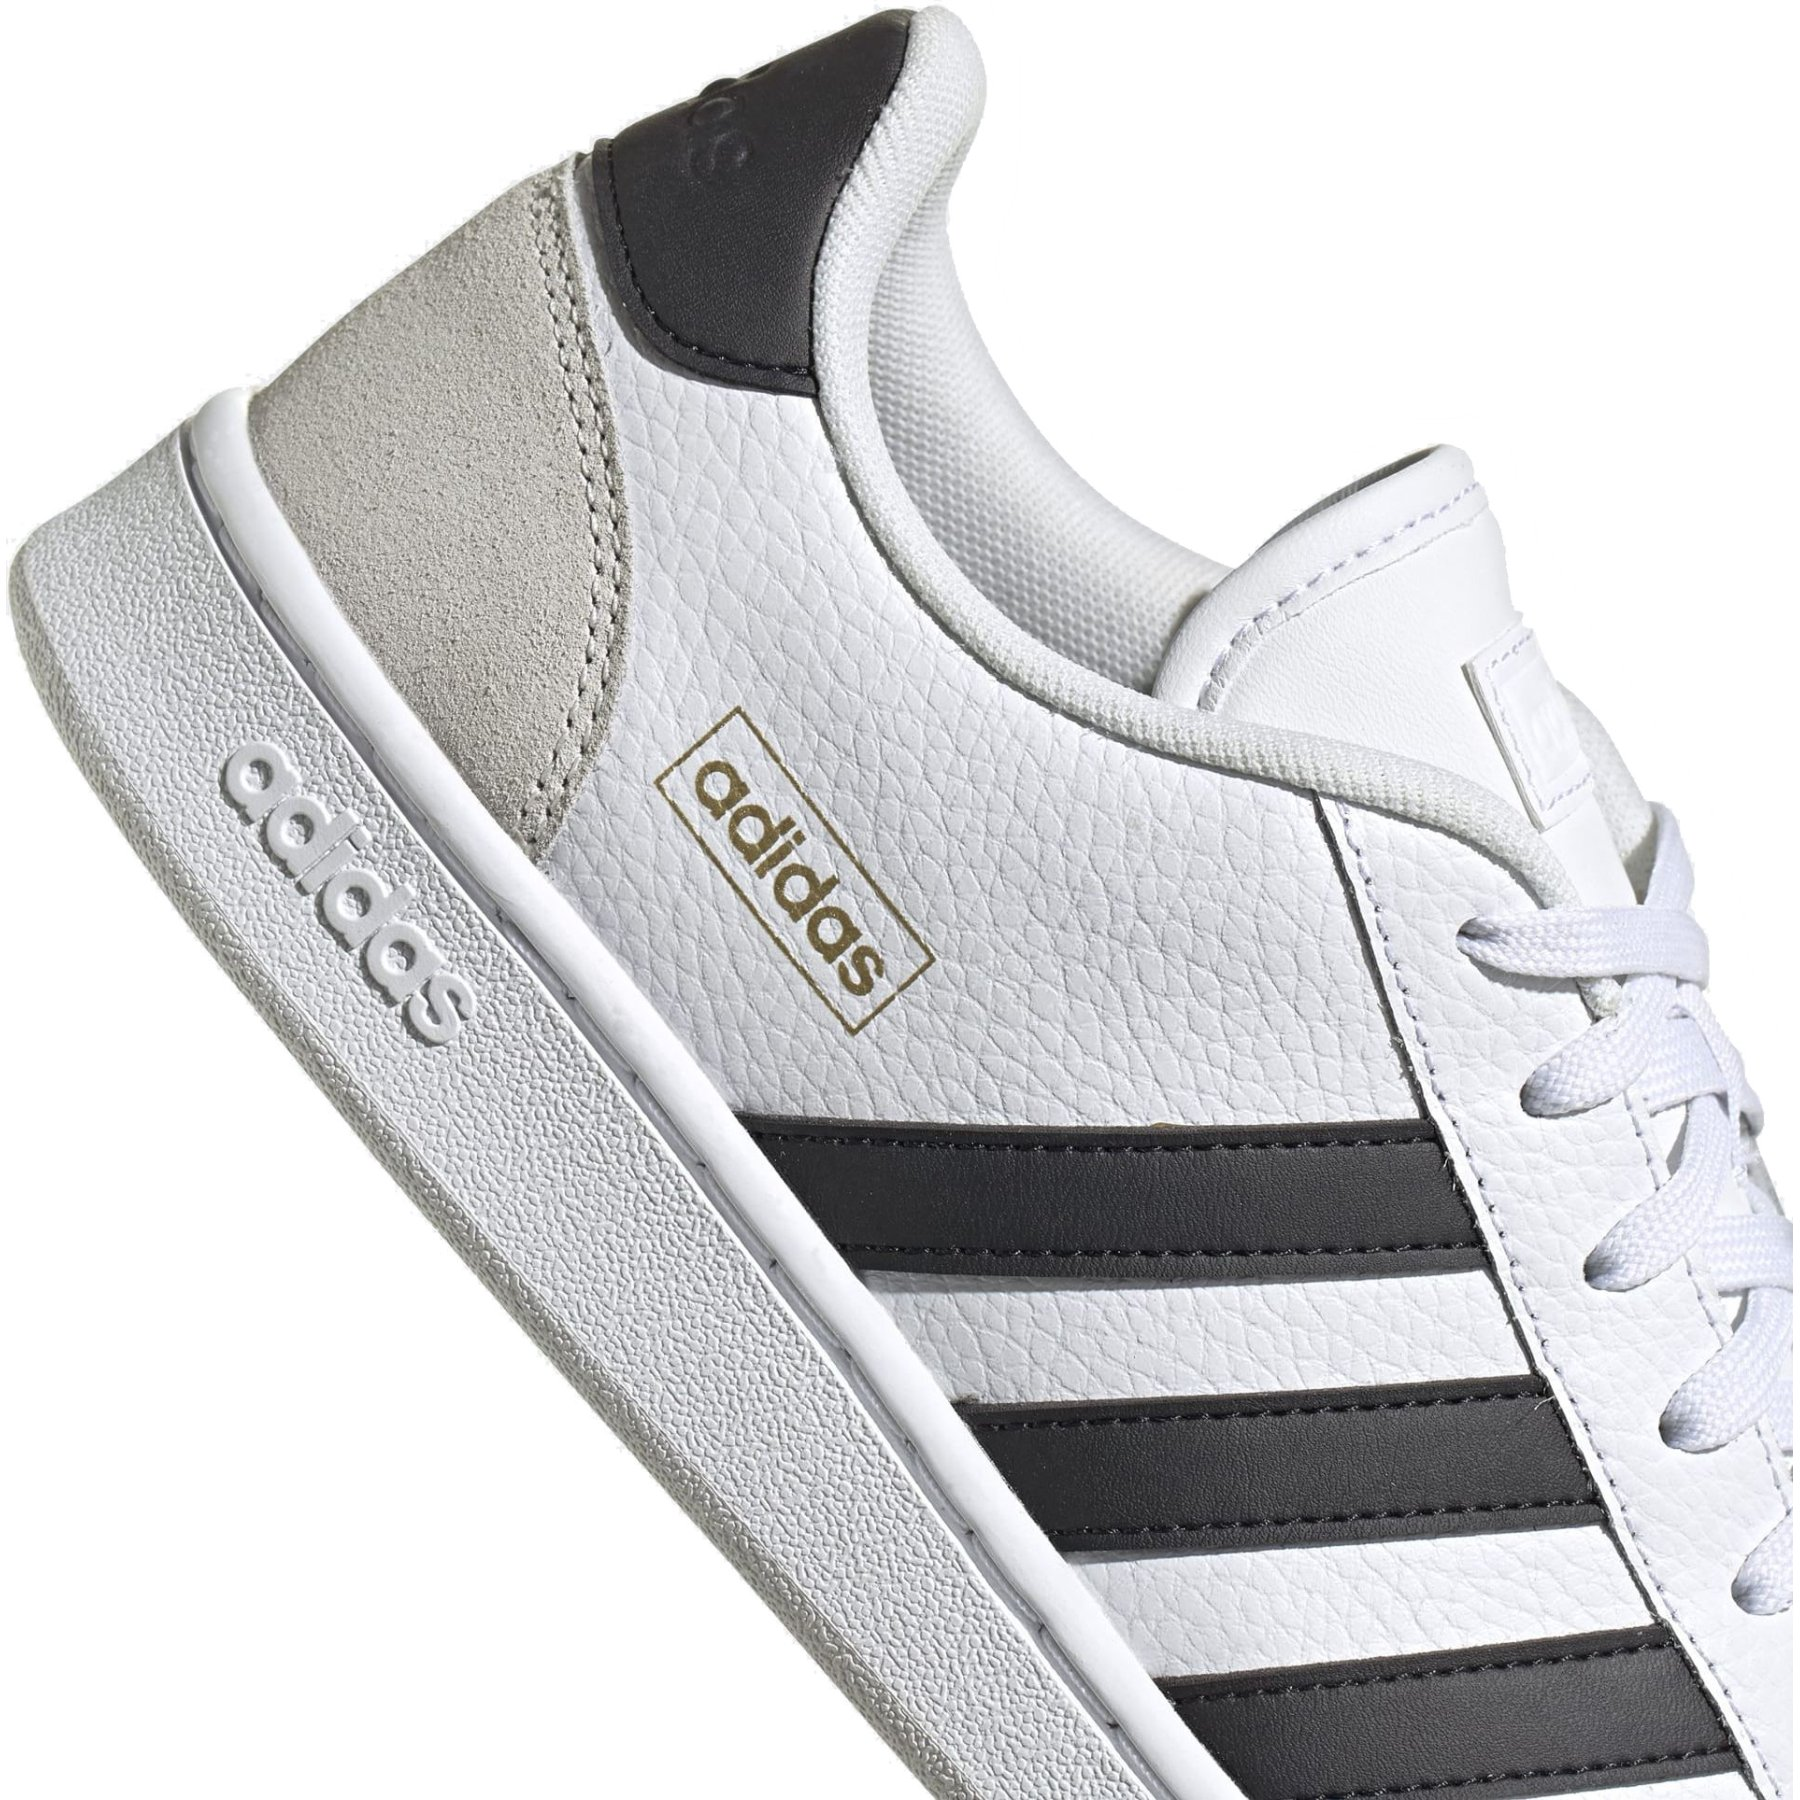 Image of adidas Grand Court SE Shoes - cloud white/core black/orbit grey FW3277